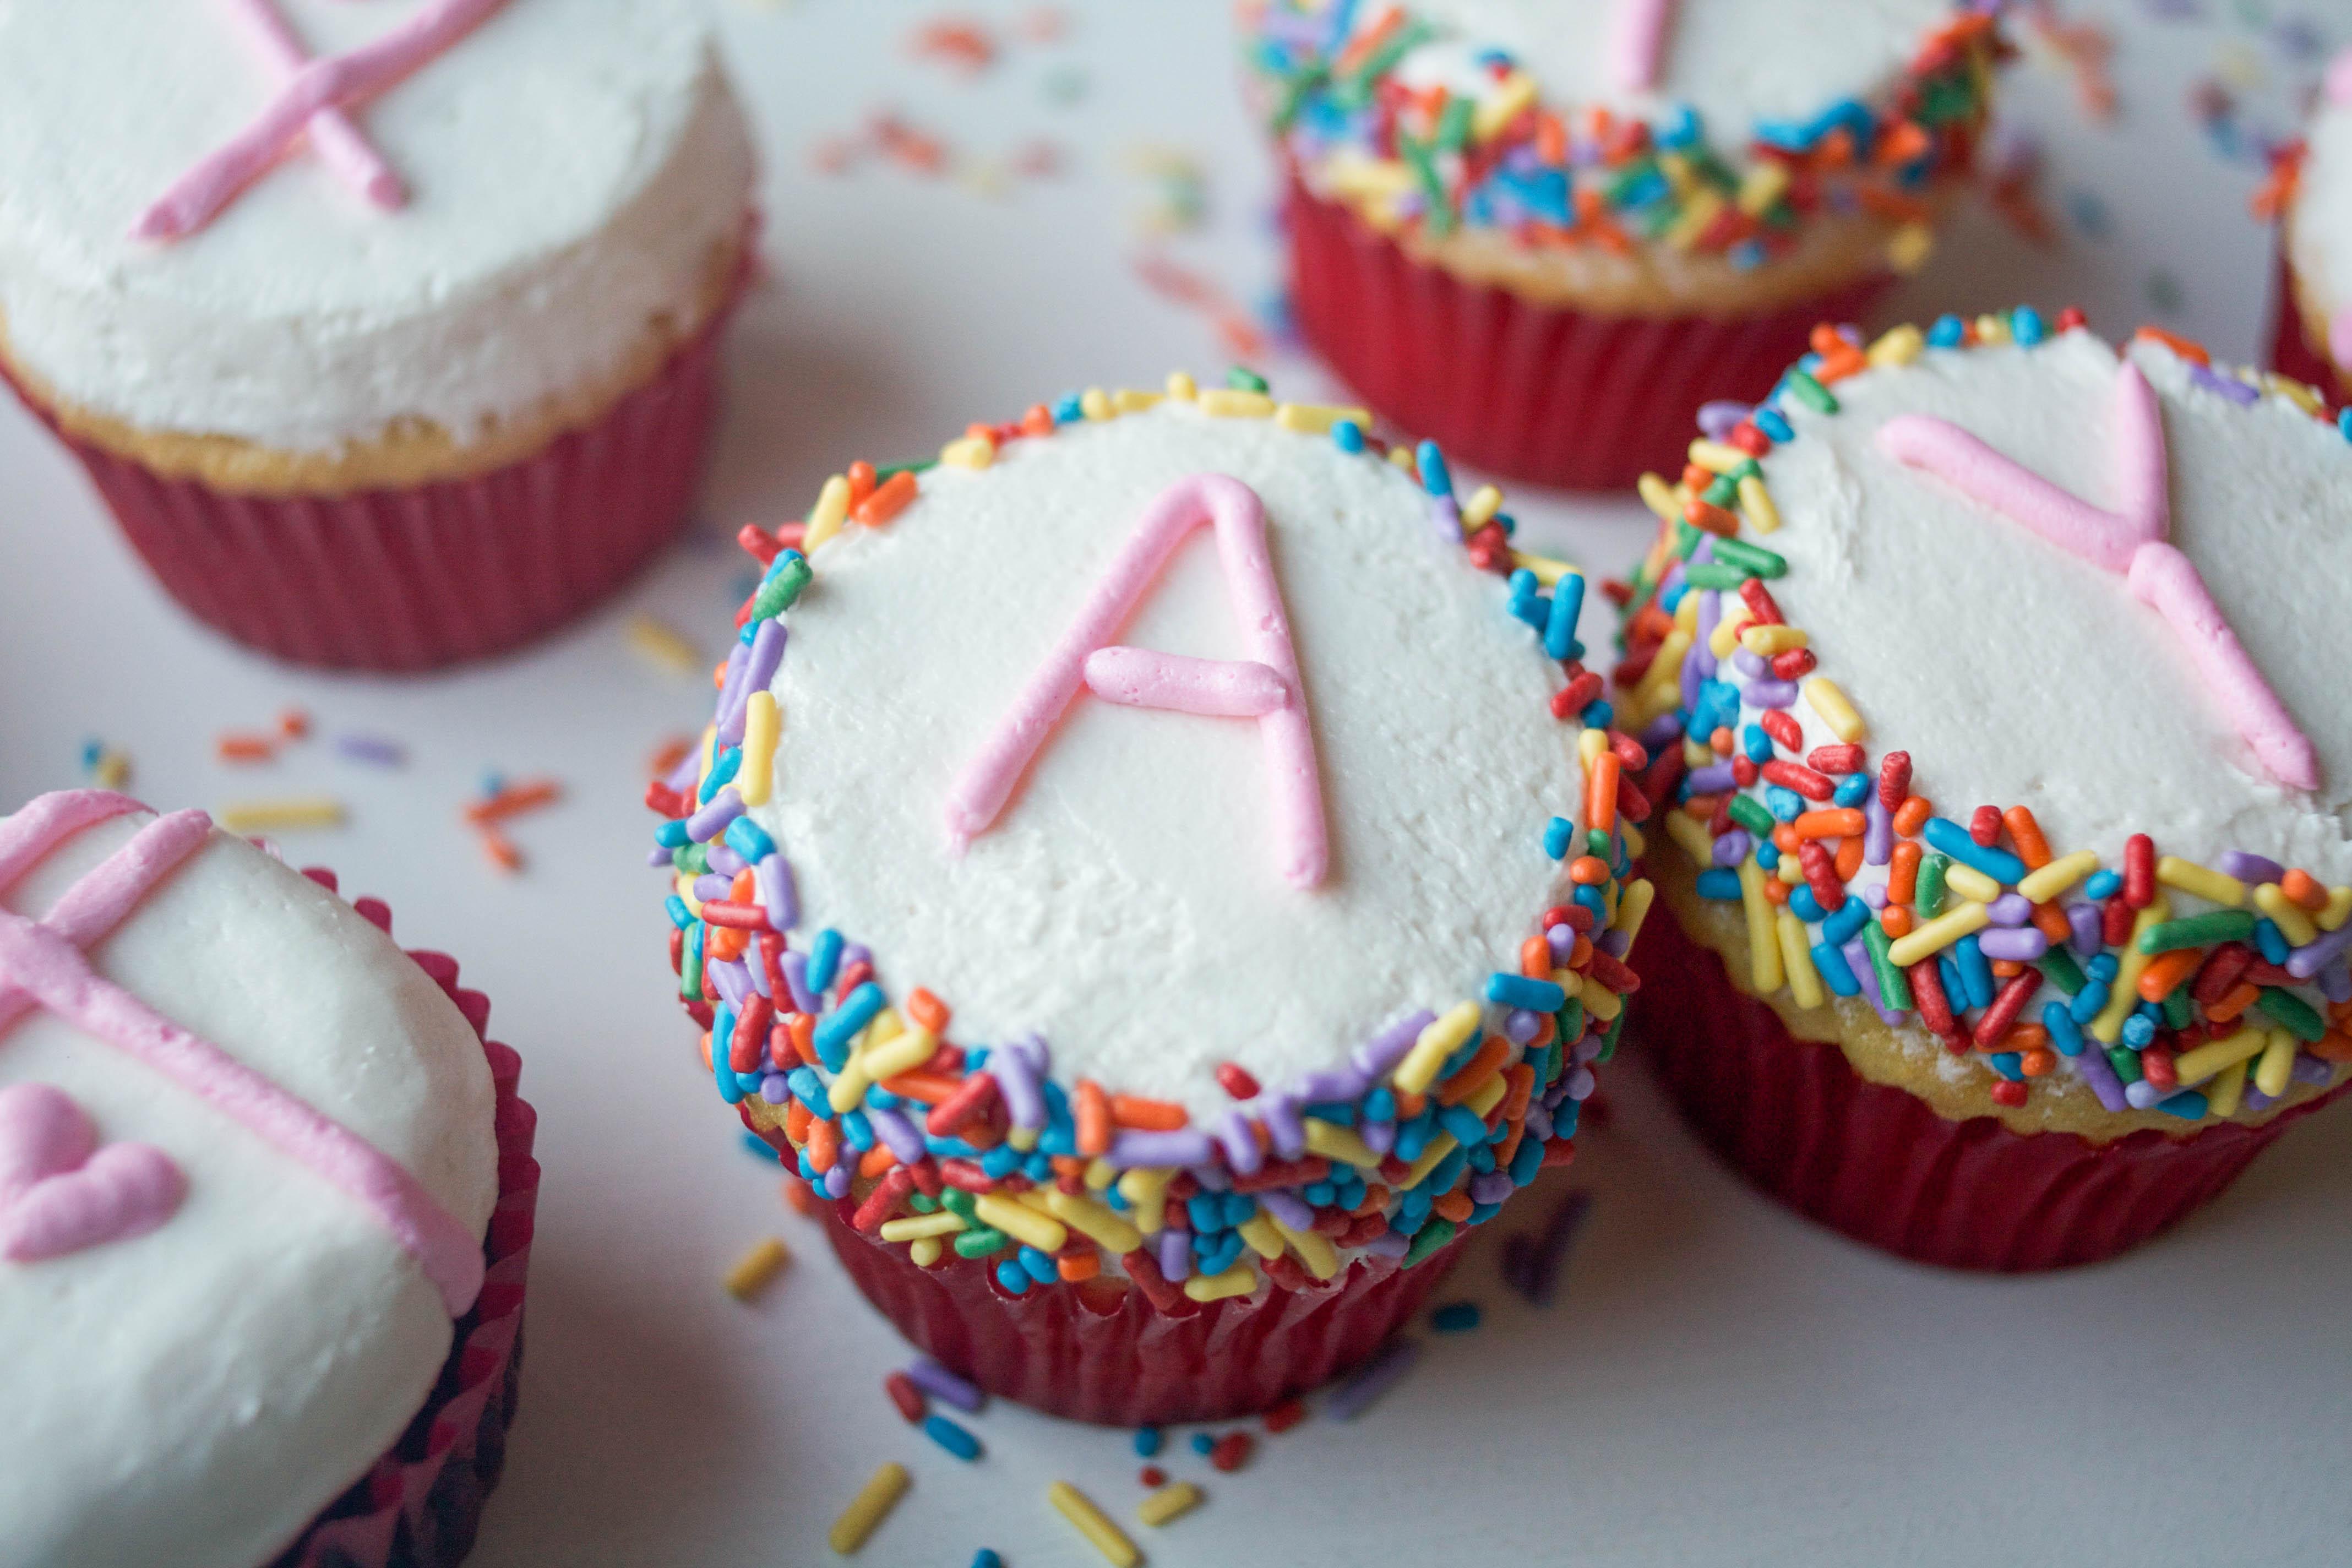 Flat Top Cupcake With Sprinkles | Erin Gardner | Bluprint